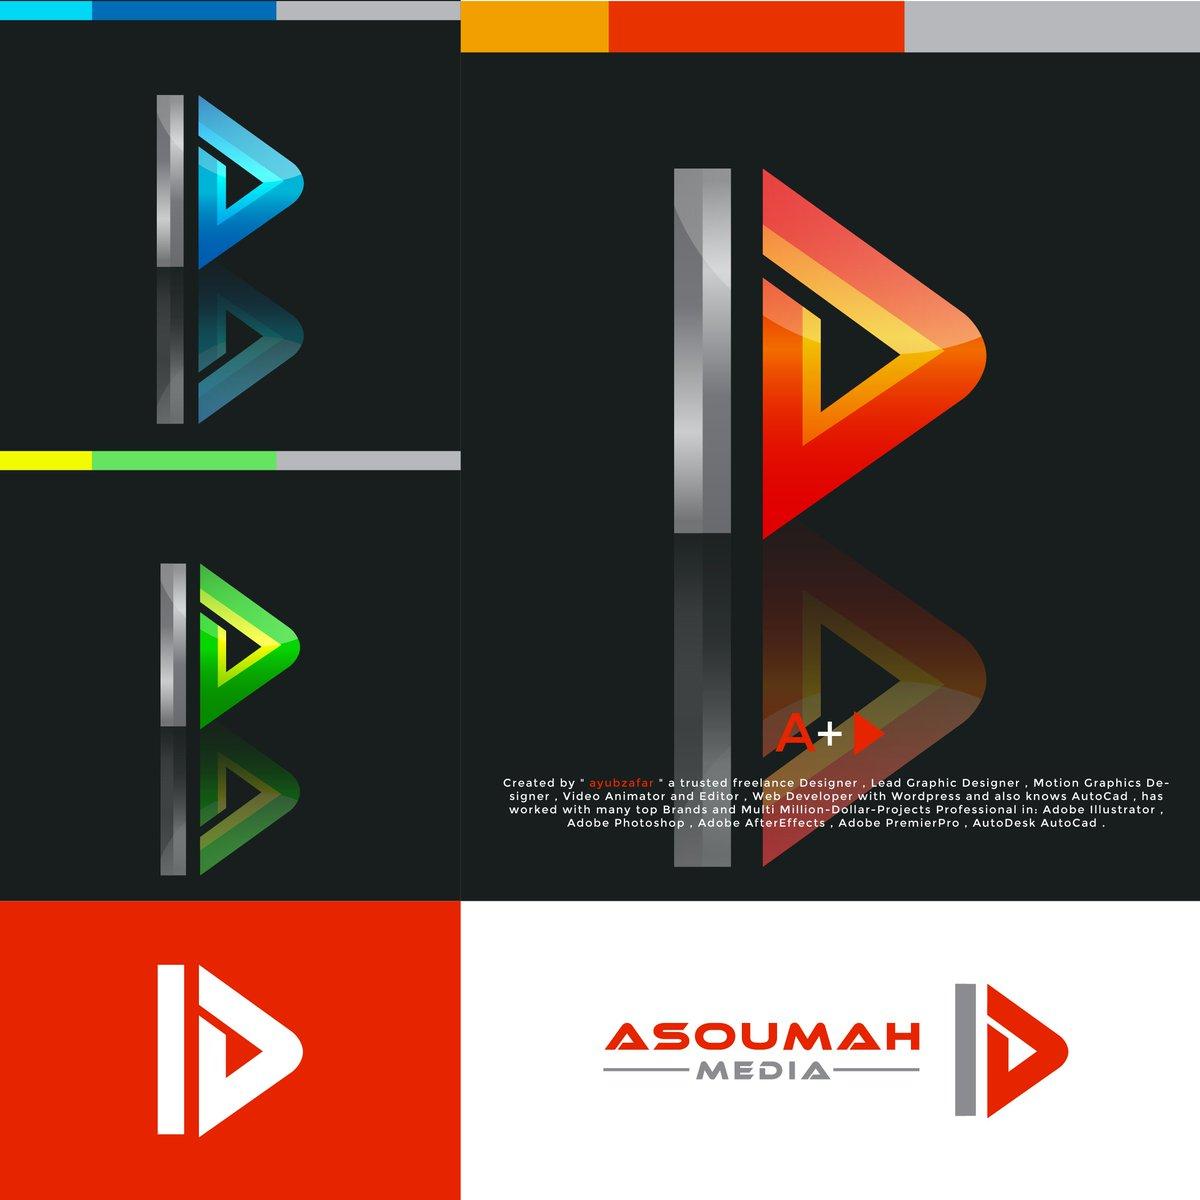 "3D Logo Design For ""Asoumah Media"" by @ayubzafar2 . . Order a Highly Professional Brand Logo Now . . Follow for more @ayubzafar2 for more  . #3ddesign #mediaset #media #mediacorp #corp #mediacompany #telecommunications #3dlogo #versatilemedia #workshops #MediaGroup #ayubzafarpic.twitter.com/PaPbK6AT2A"